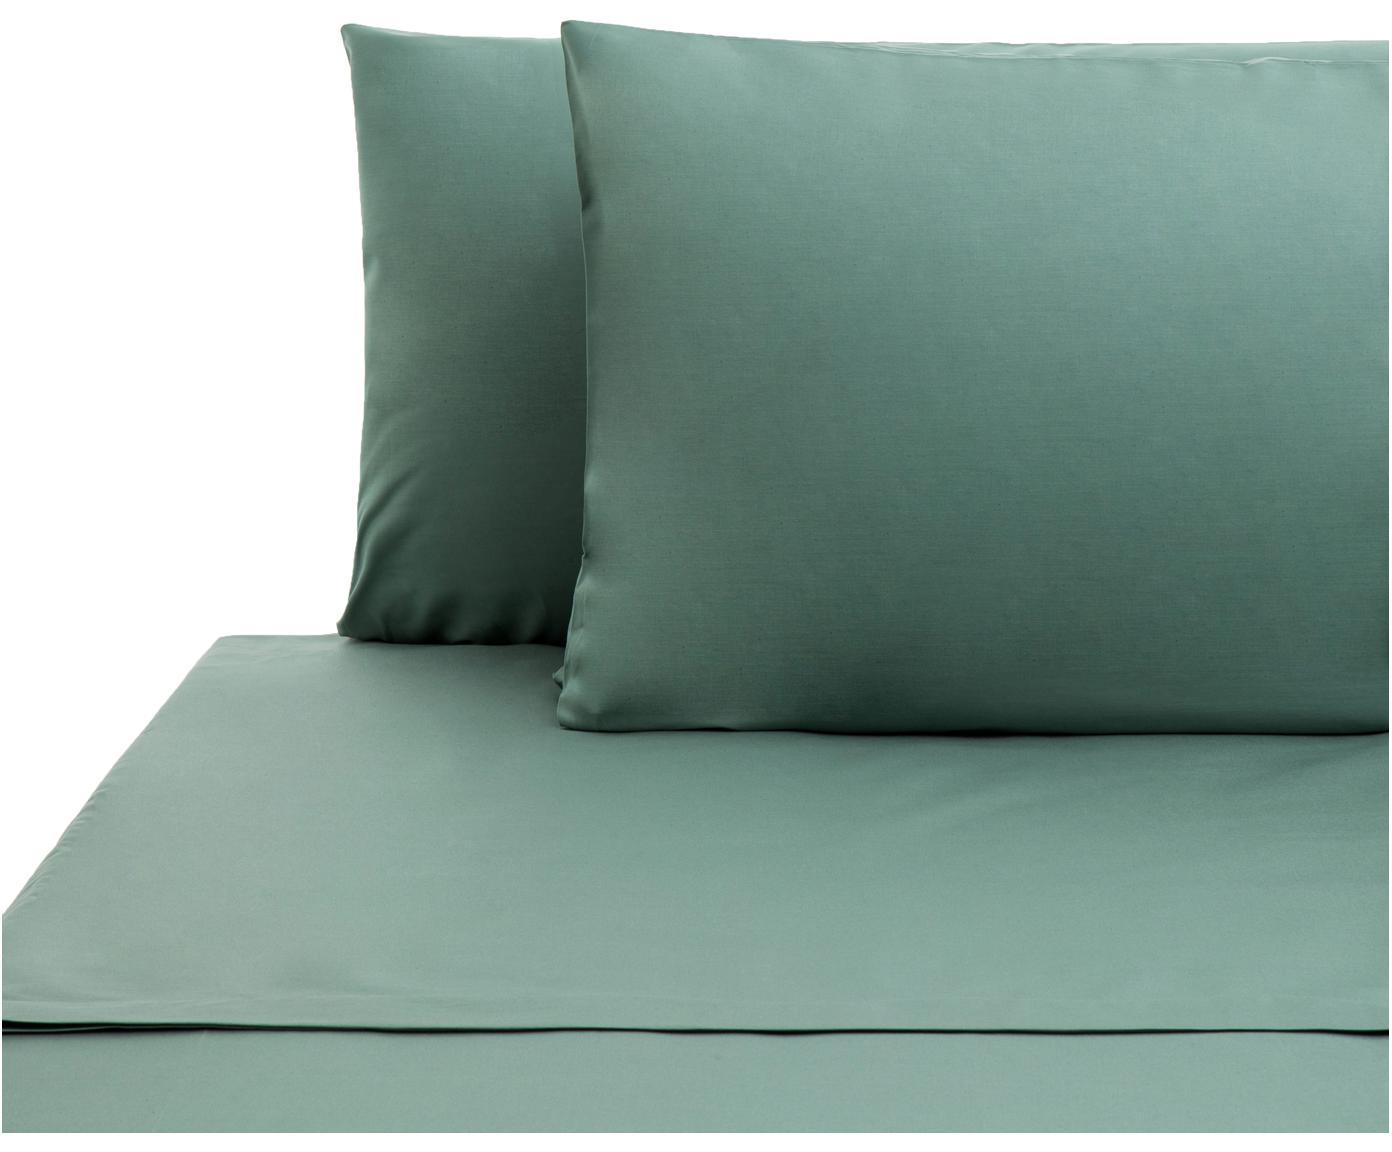 Set lenzuola in cotone ranforce Lenare 2 pz, Tessuto: Renforcé, Fronte e retro: verde reseda, 180 x 290 cm